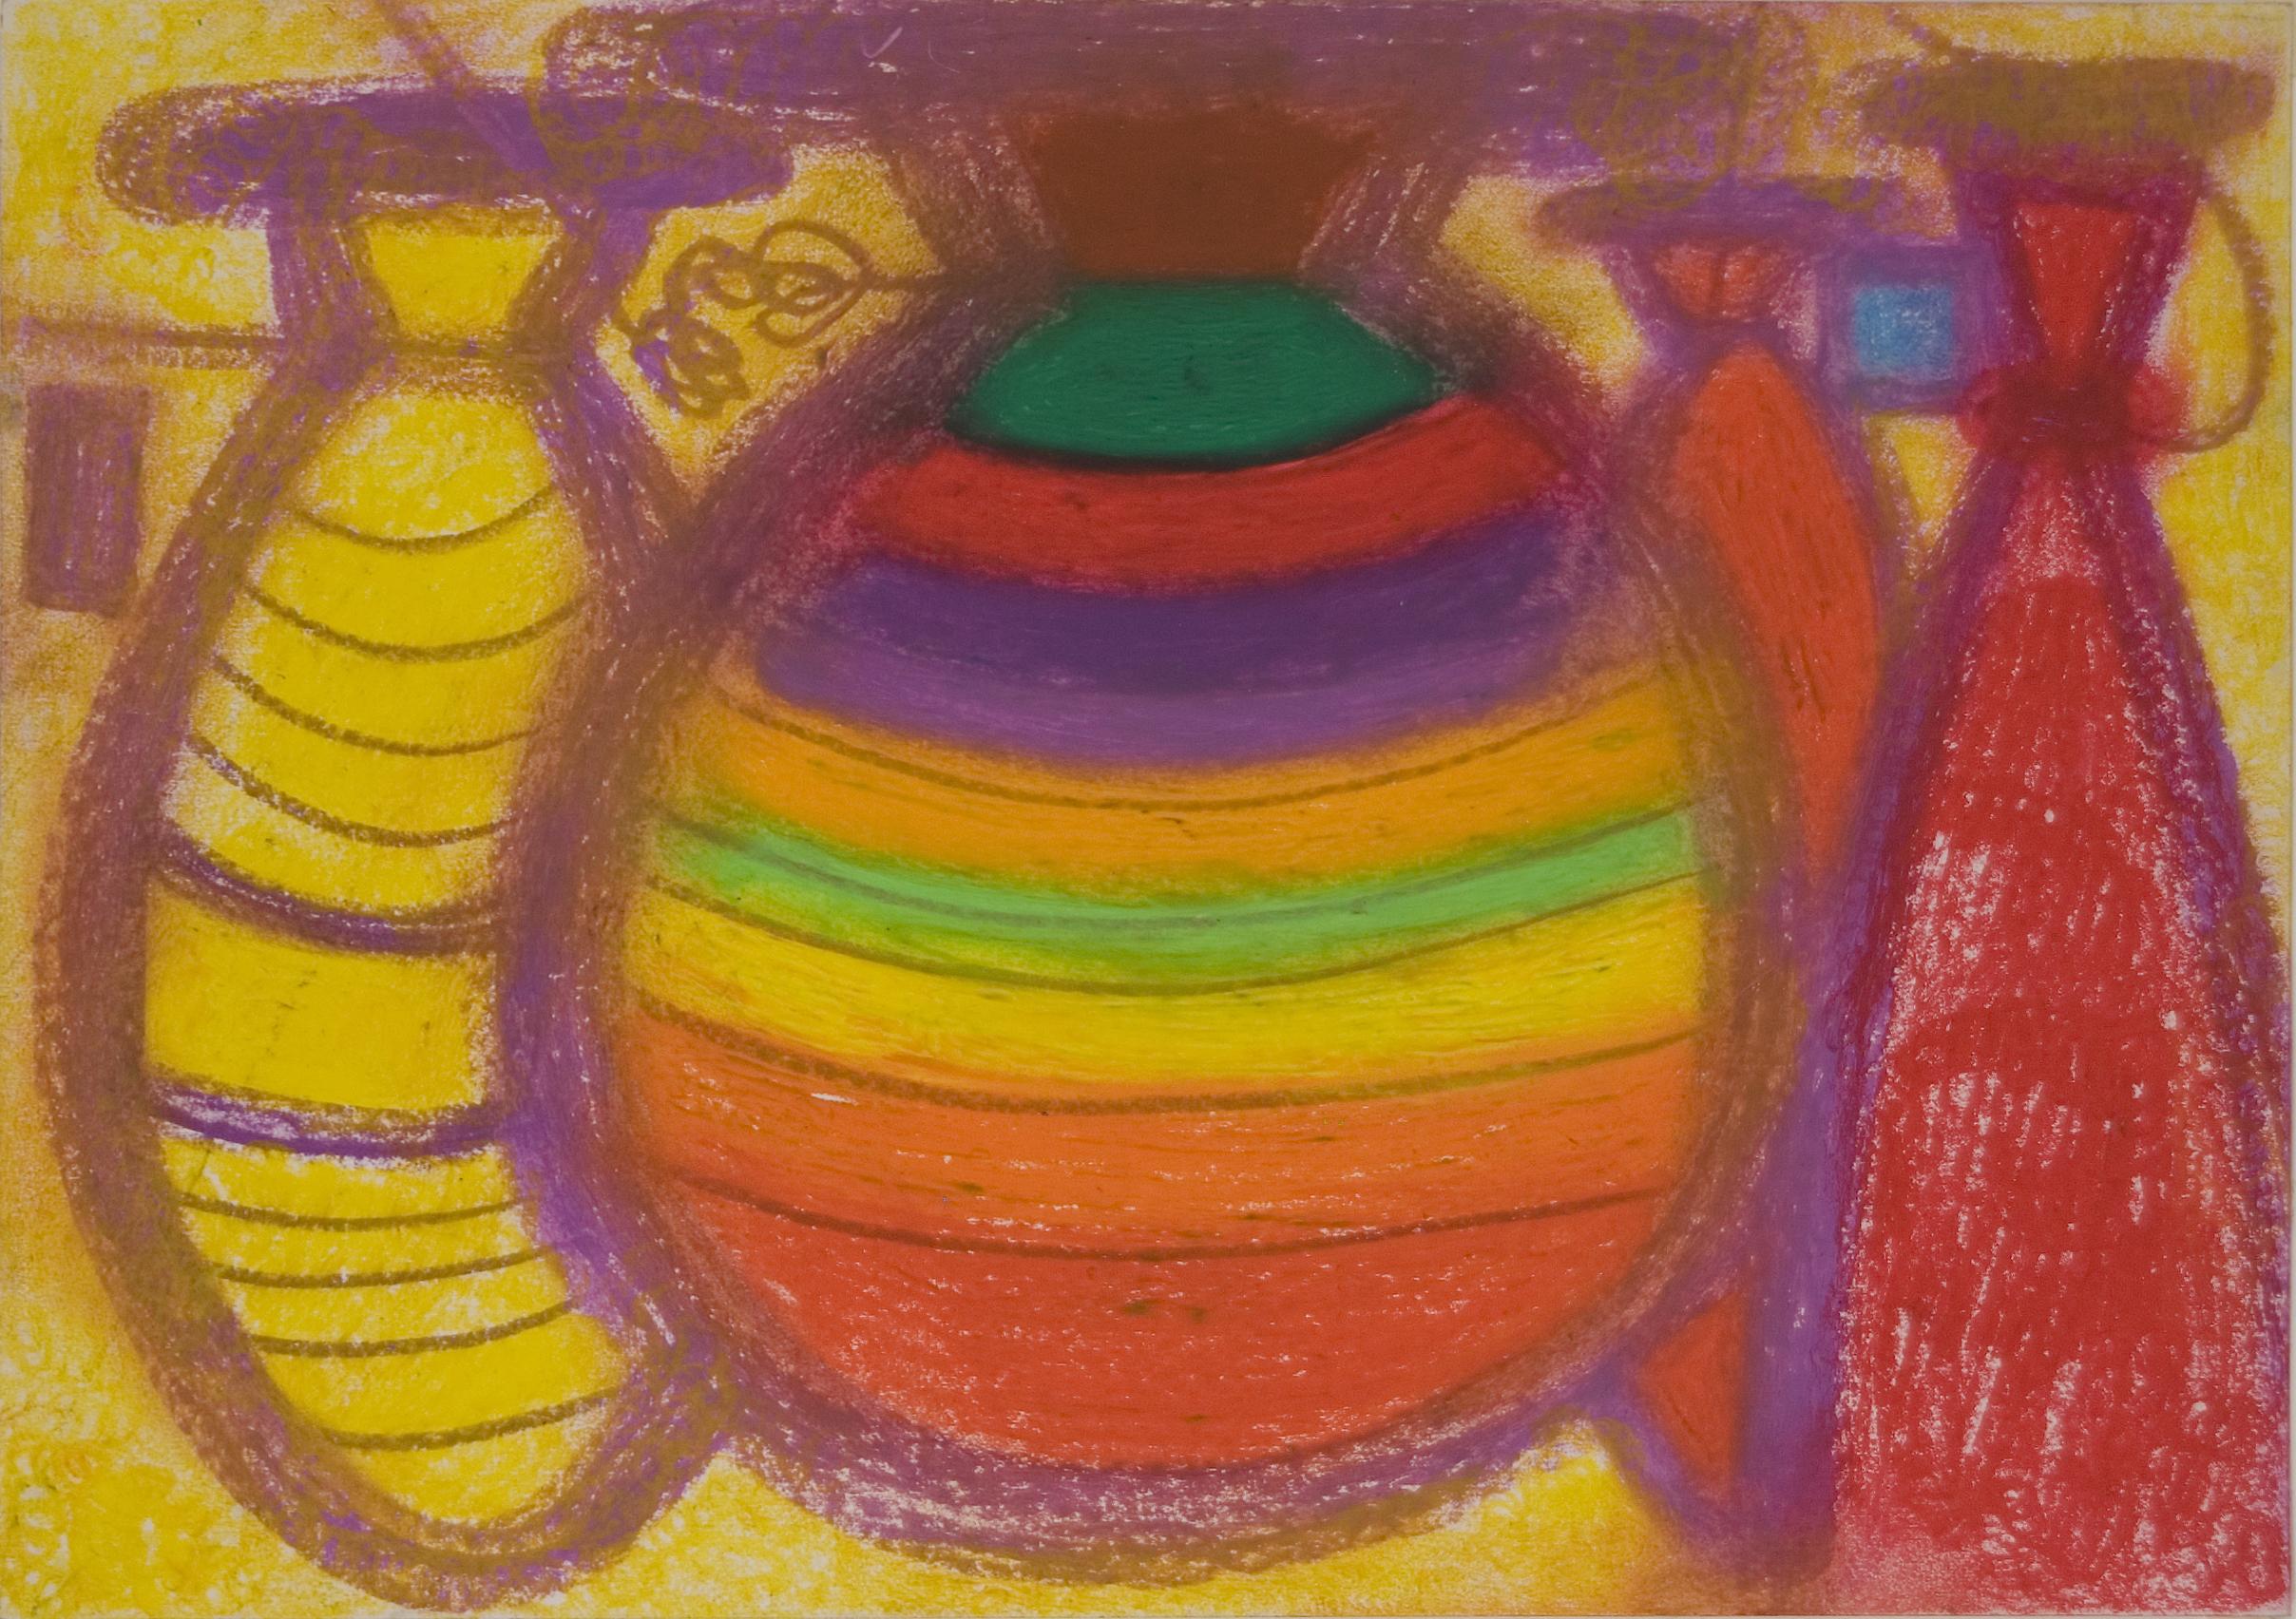 Keigo Mitsui  Balloon  , 2002 Crayon, paper 21.25 x 15 inches 54 x 38.1 cm KeM 9